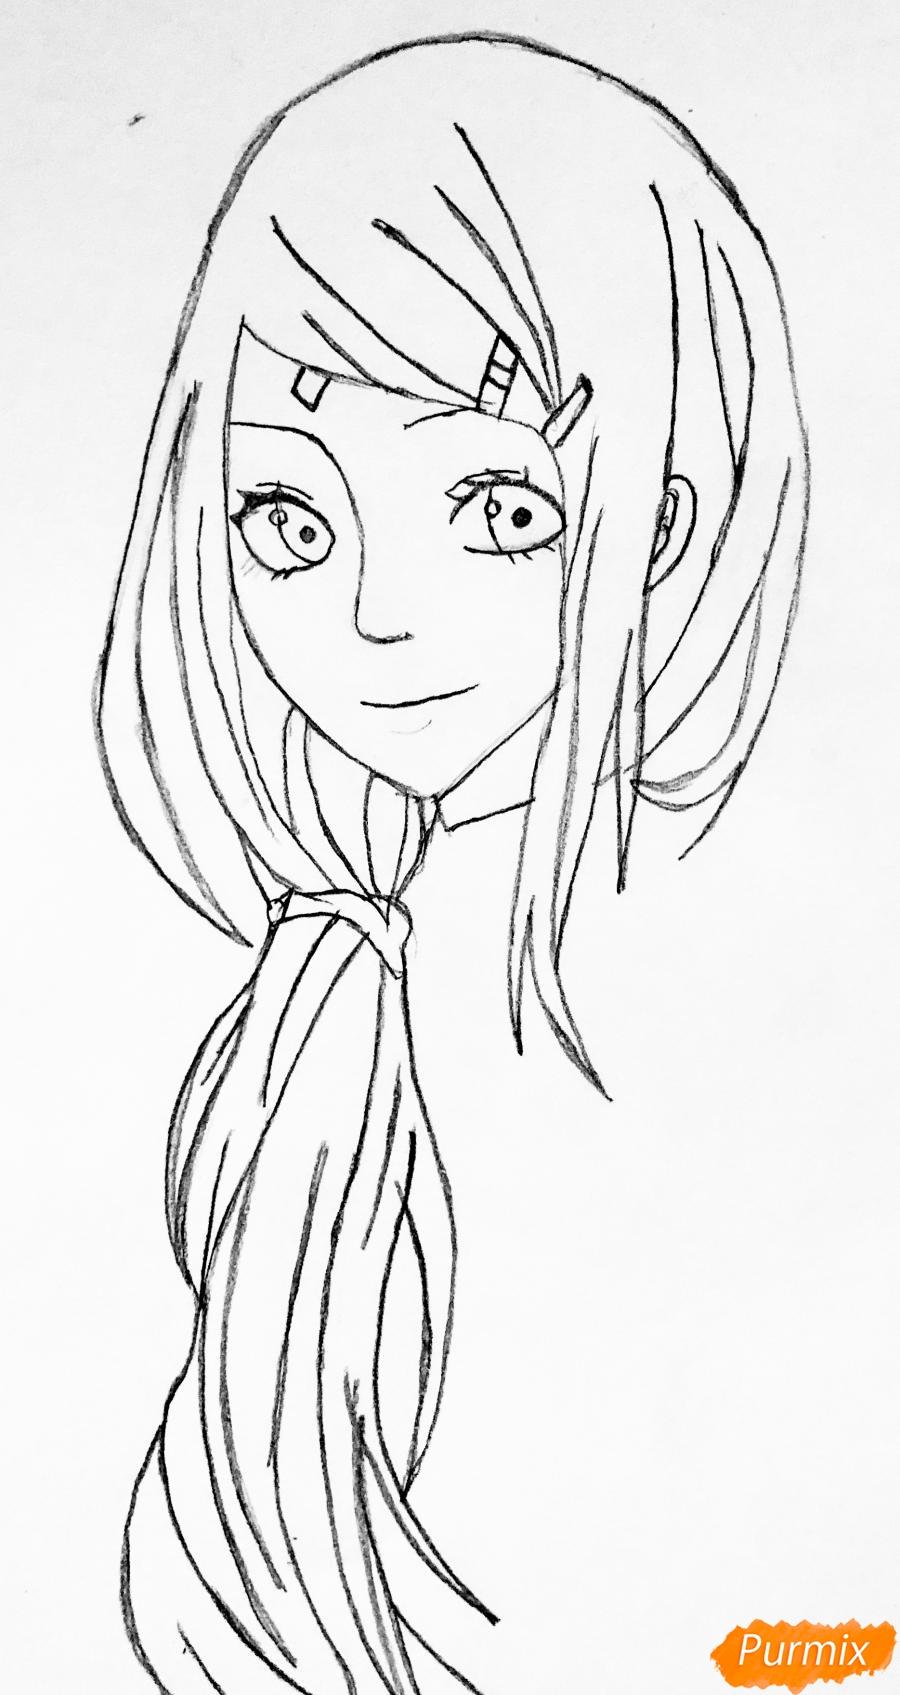 Рисуем Сакуру из Наруто цветными карандашами - шаг 4